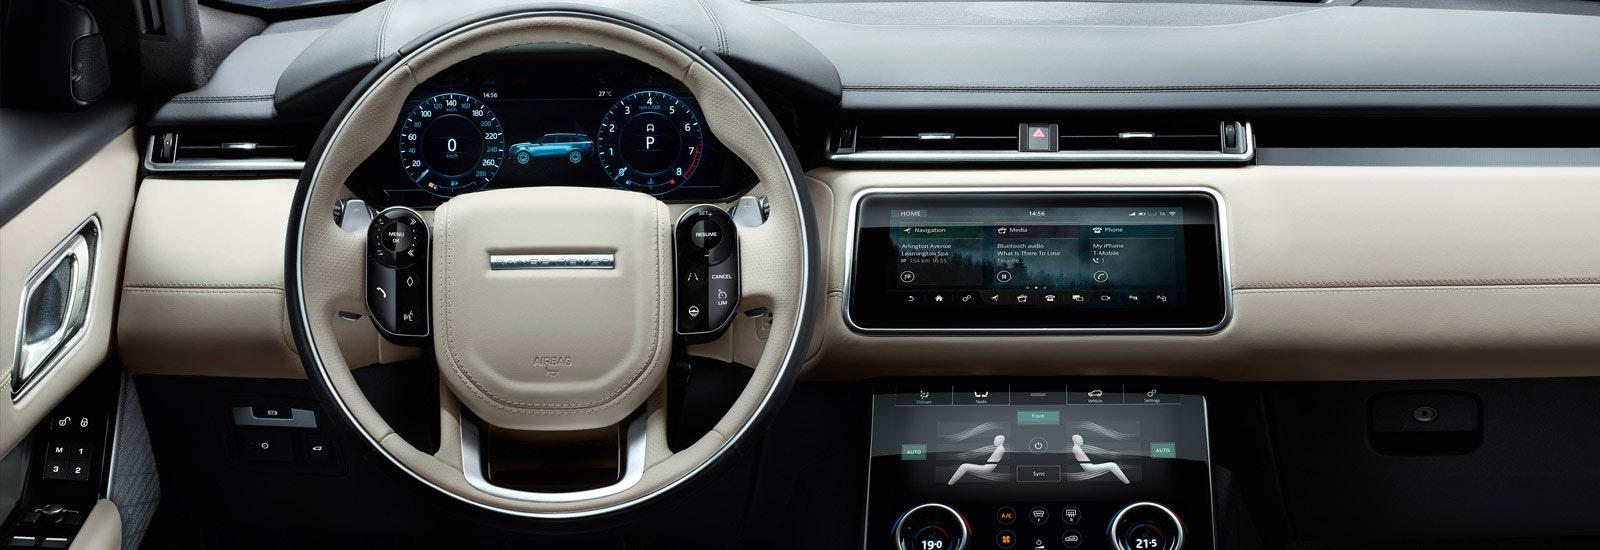 2019 Range Rover Evoque 66